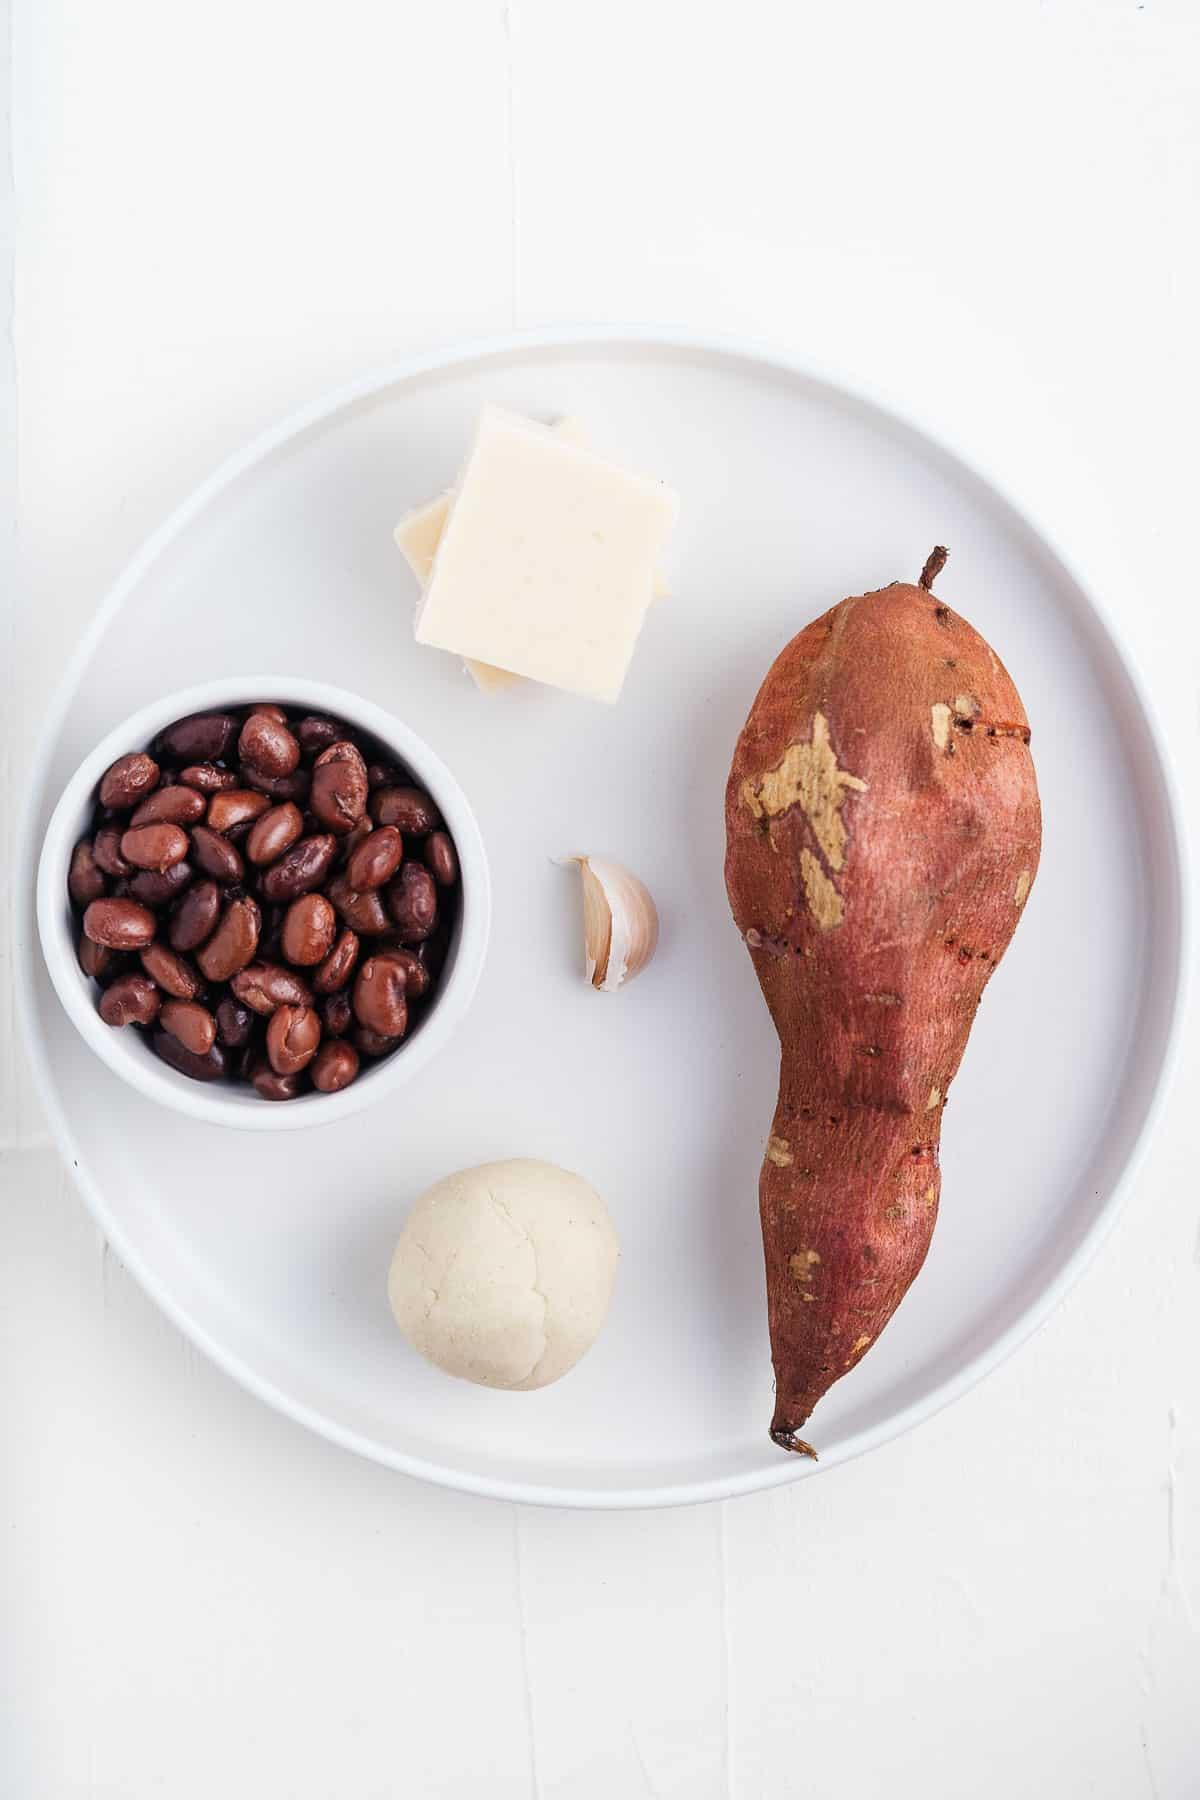 Sweet Potato, Vegan Cheese, Masa, Garlic, and Black Beans